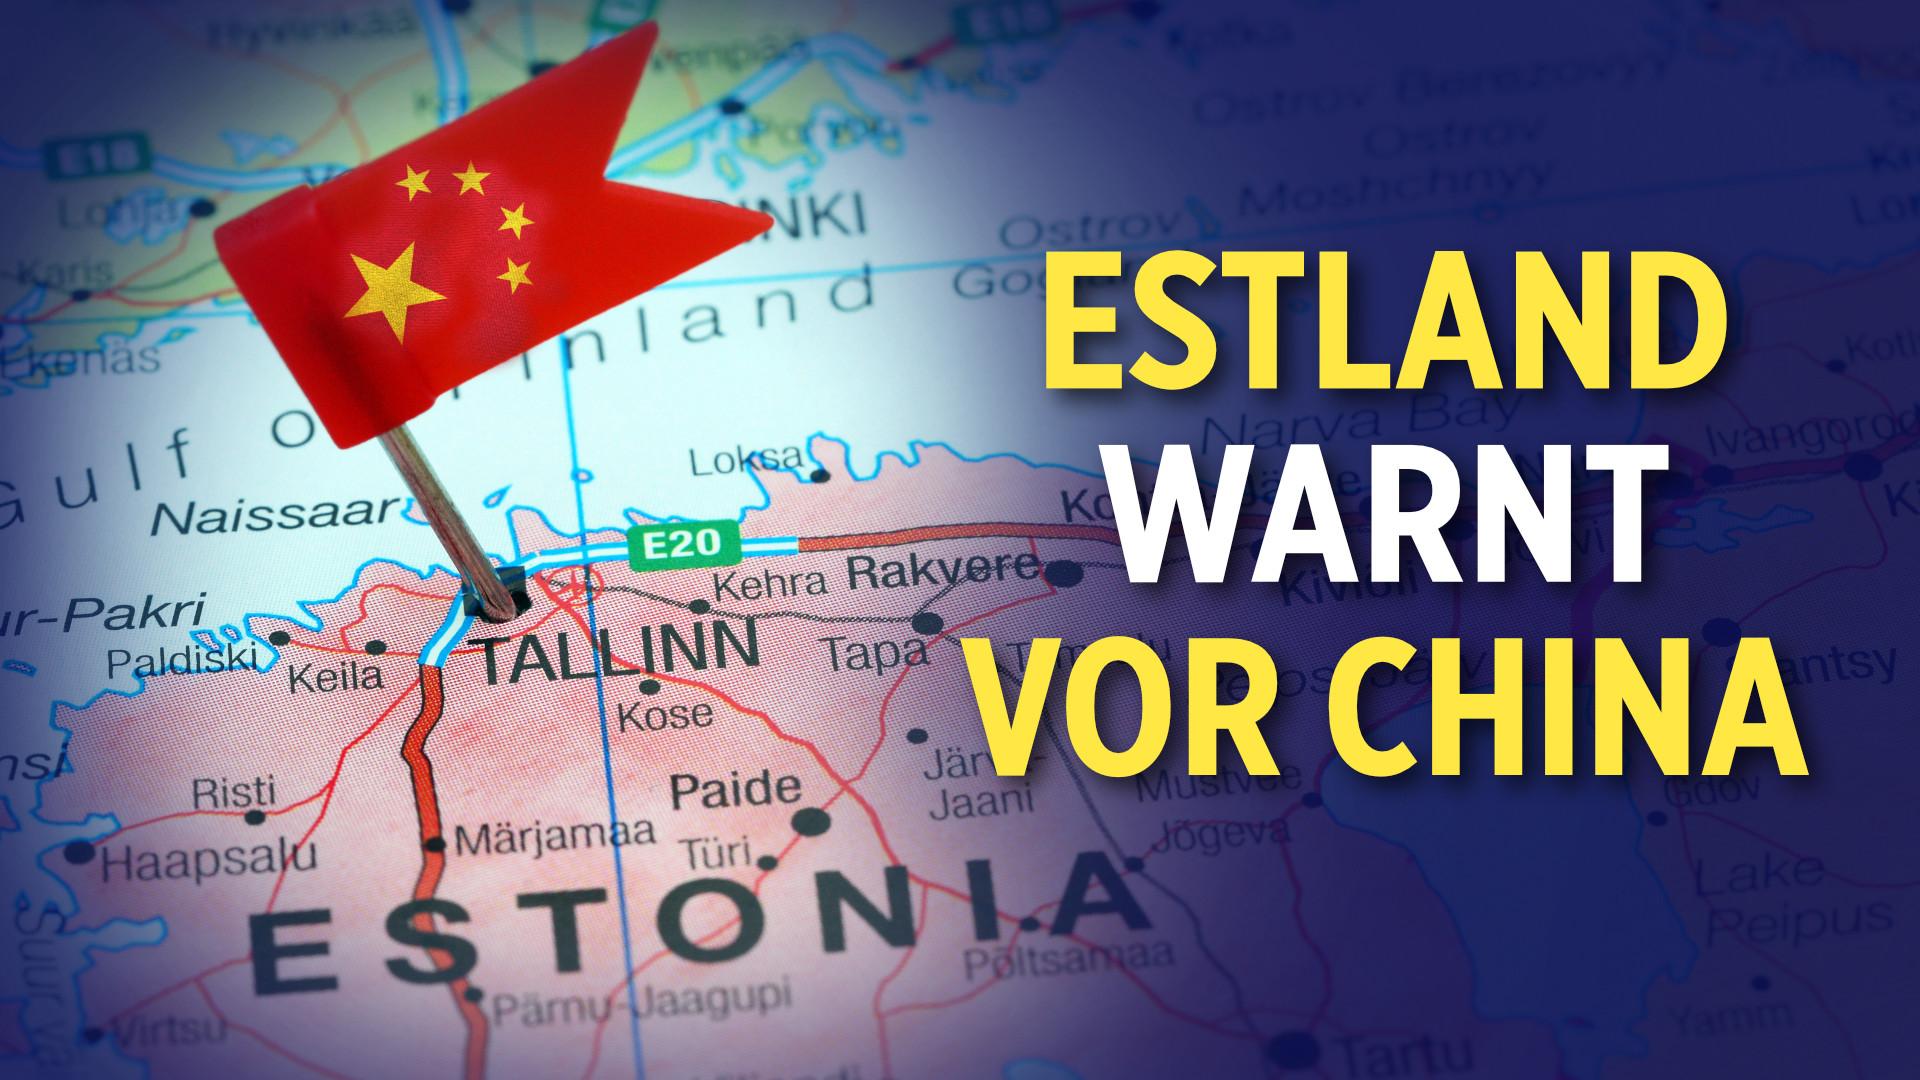 Estland warnt vor Pekings Bestrebungen | 5.000 Hongkonger beantragten Visum für UK